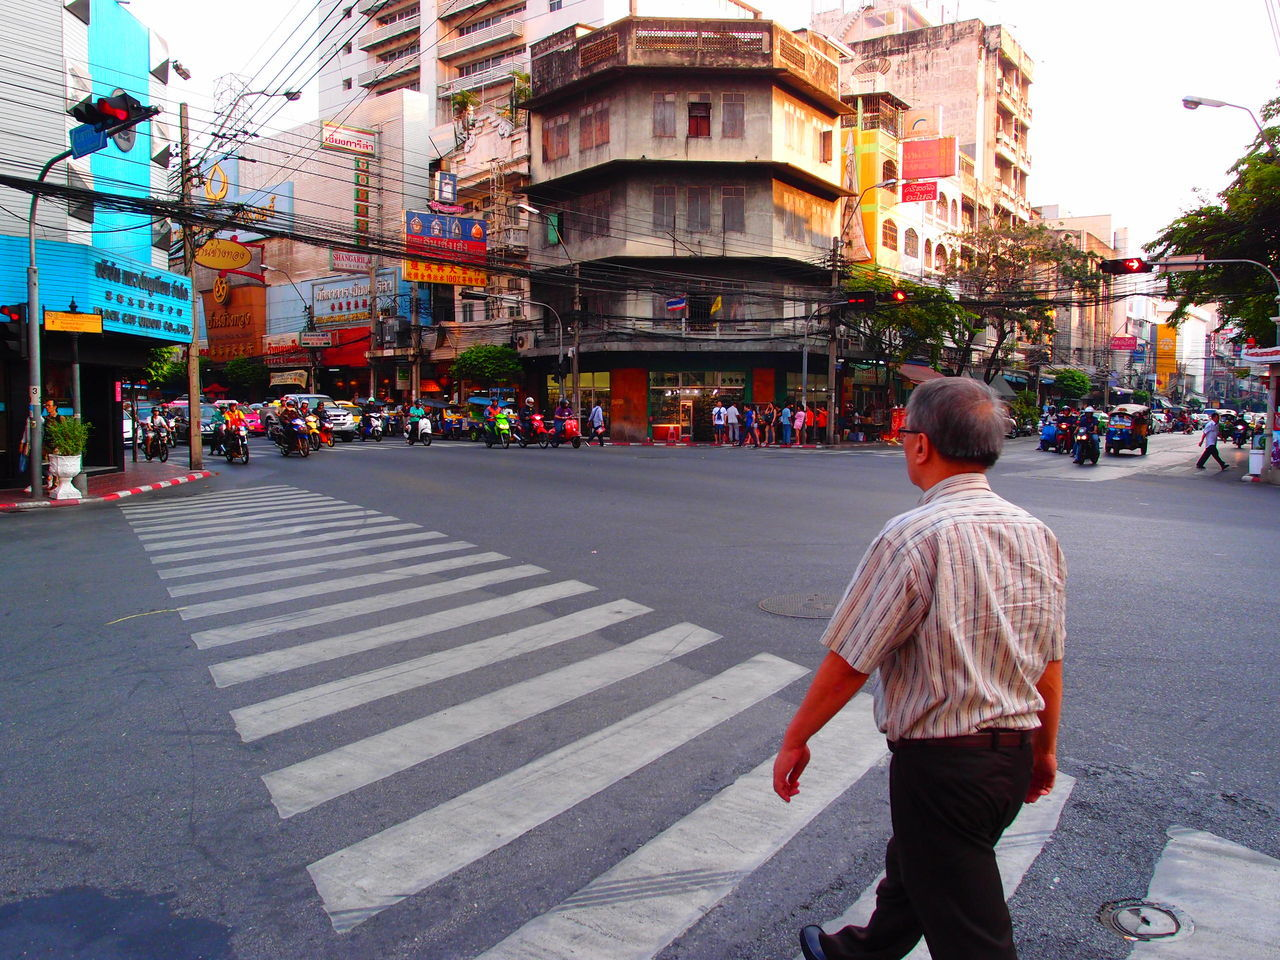 Beautiful stock photos of bangkok, rear view, city, street, adults only